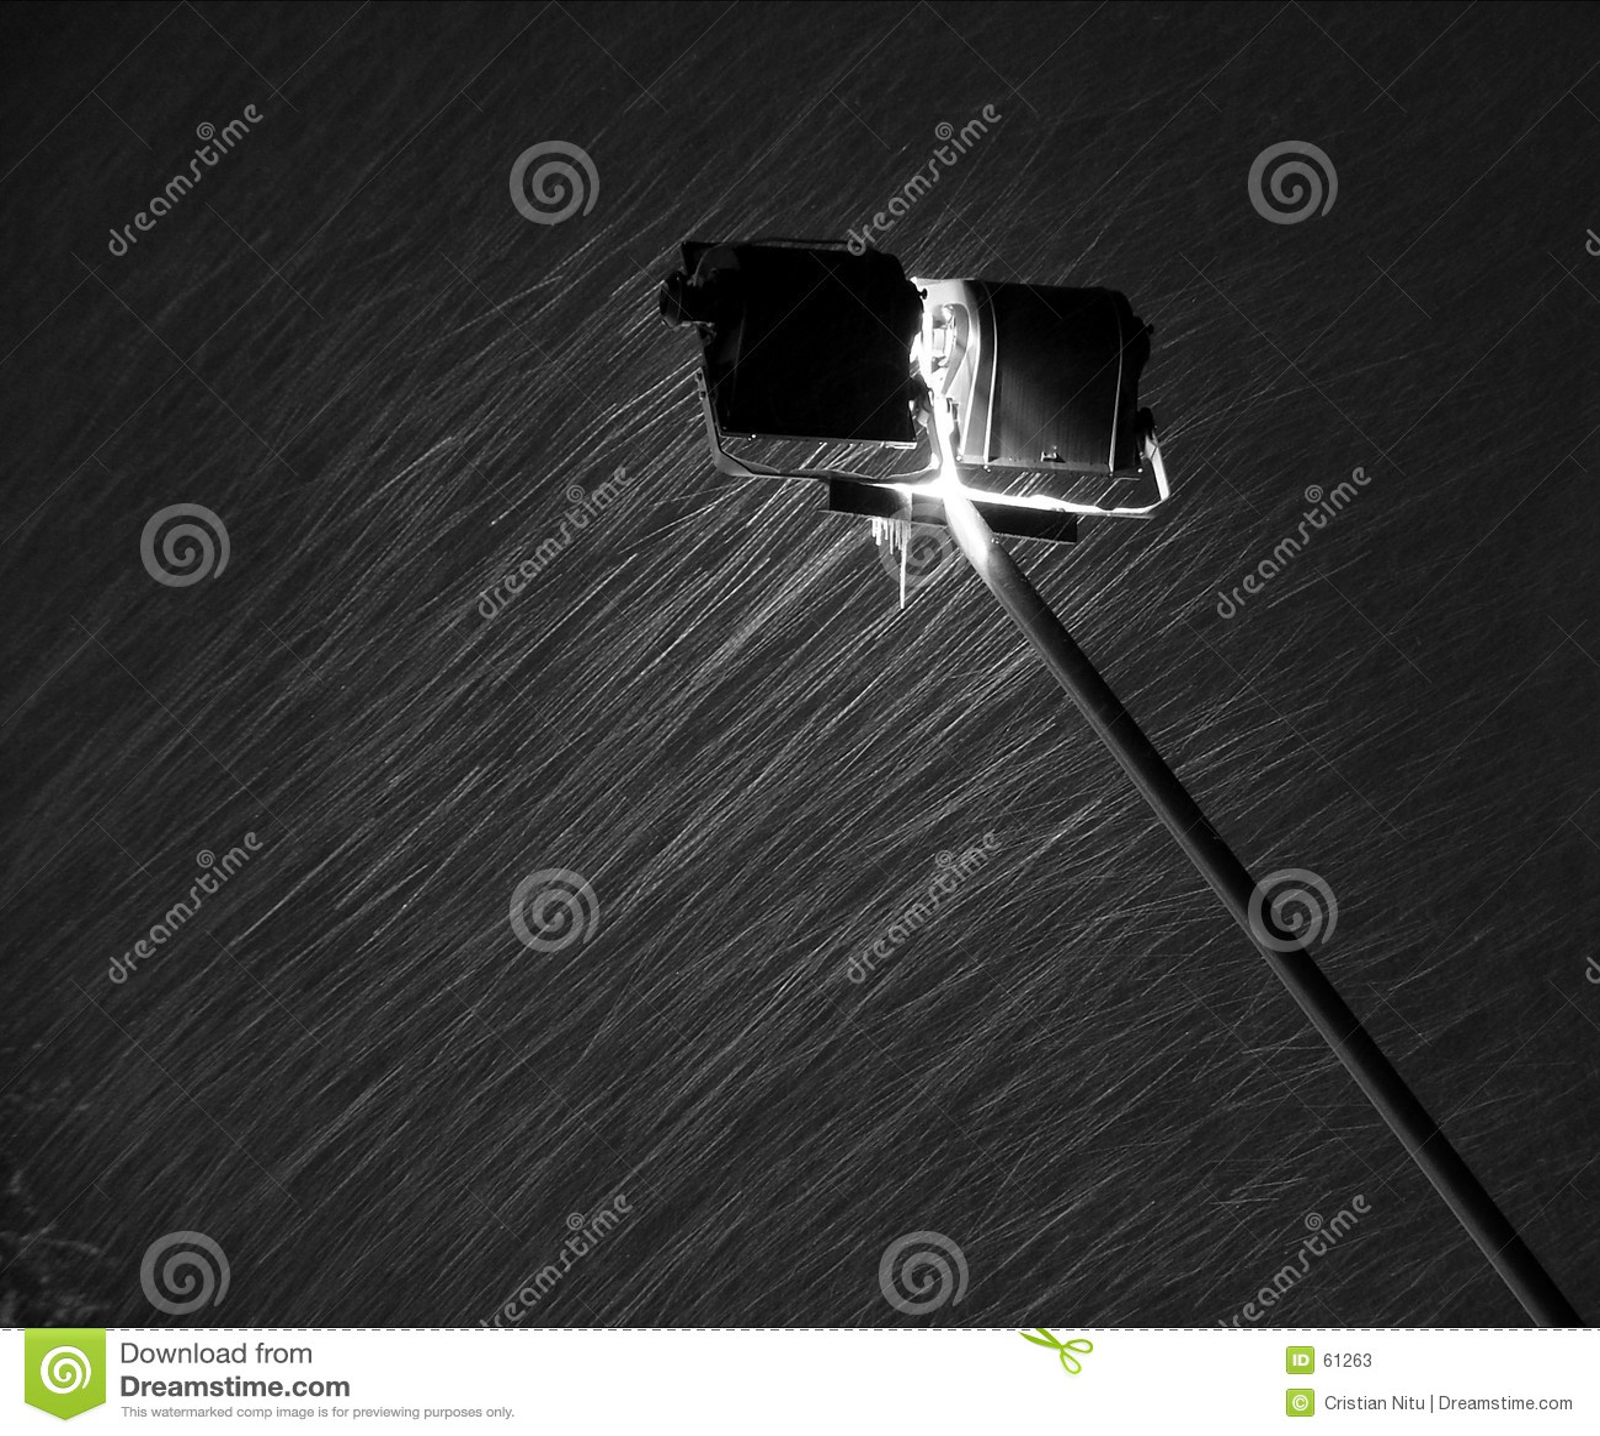 Download χιονίζοντας χρόνος στοκ εικόνα. εικόνα από φυσικός, dusk - 61263